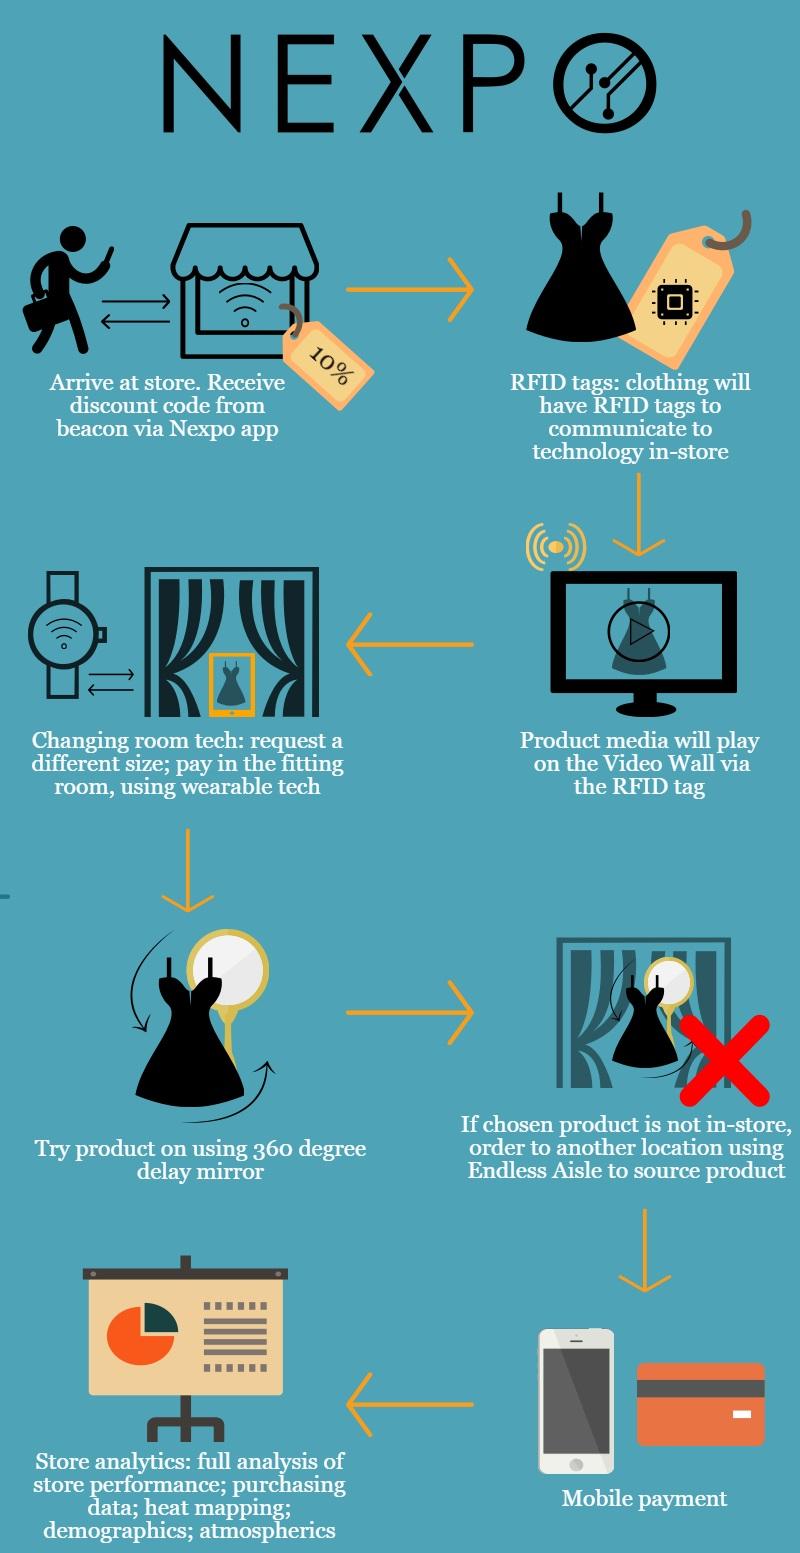 Nexpo Customer Journey Infographic